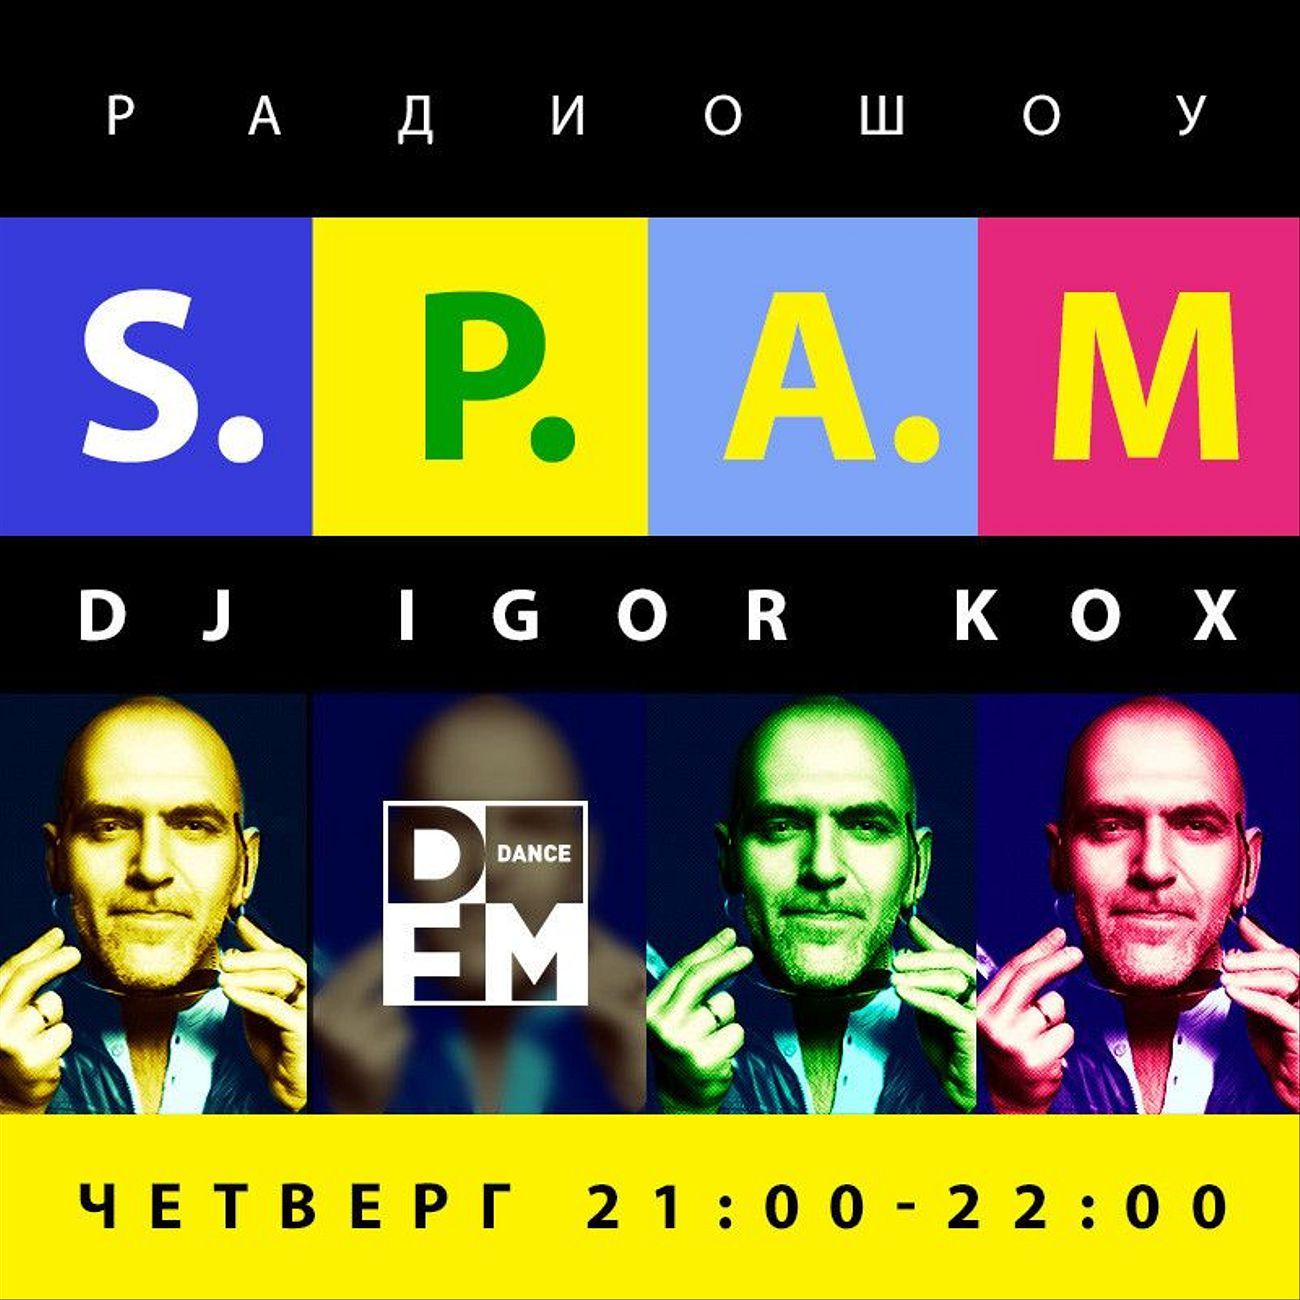 S.P.A.M. by DJ Igor Kox